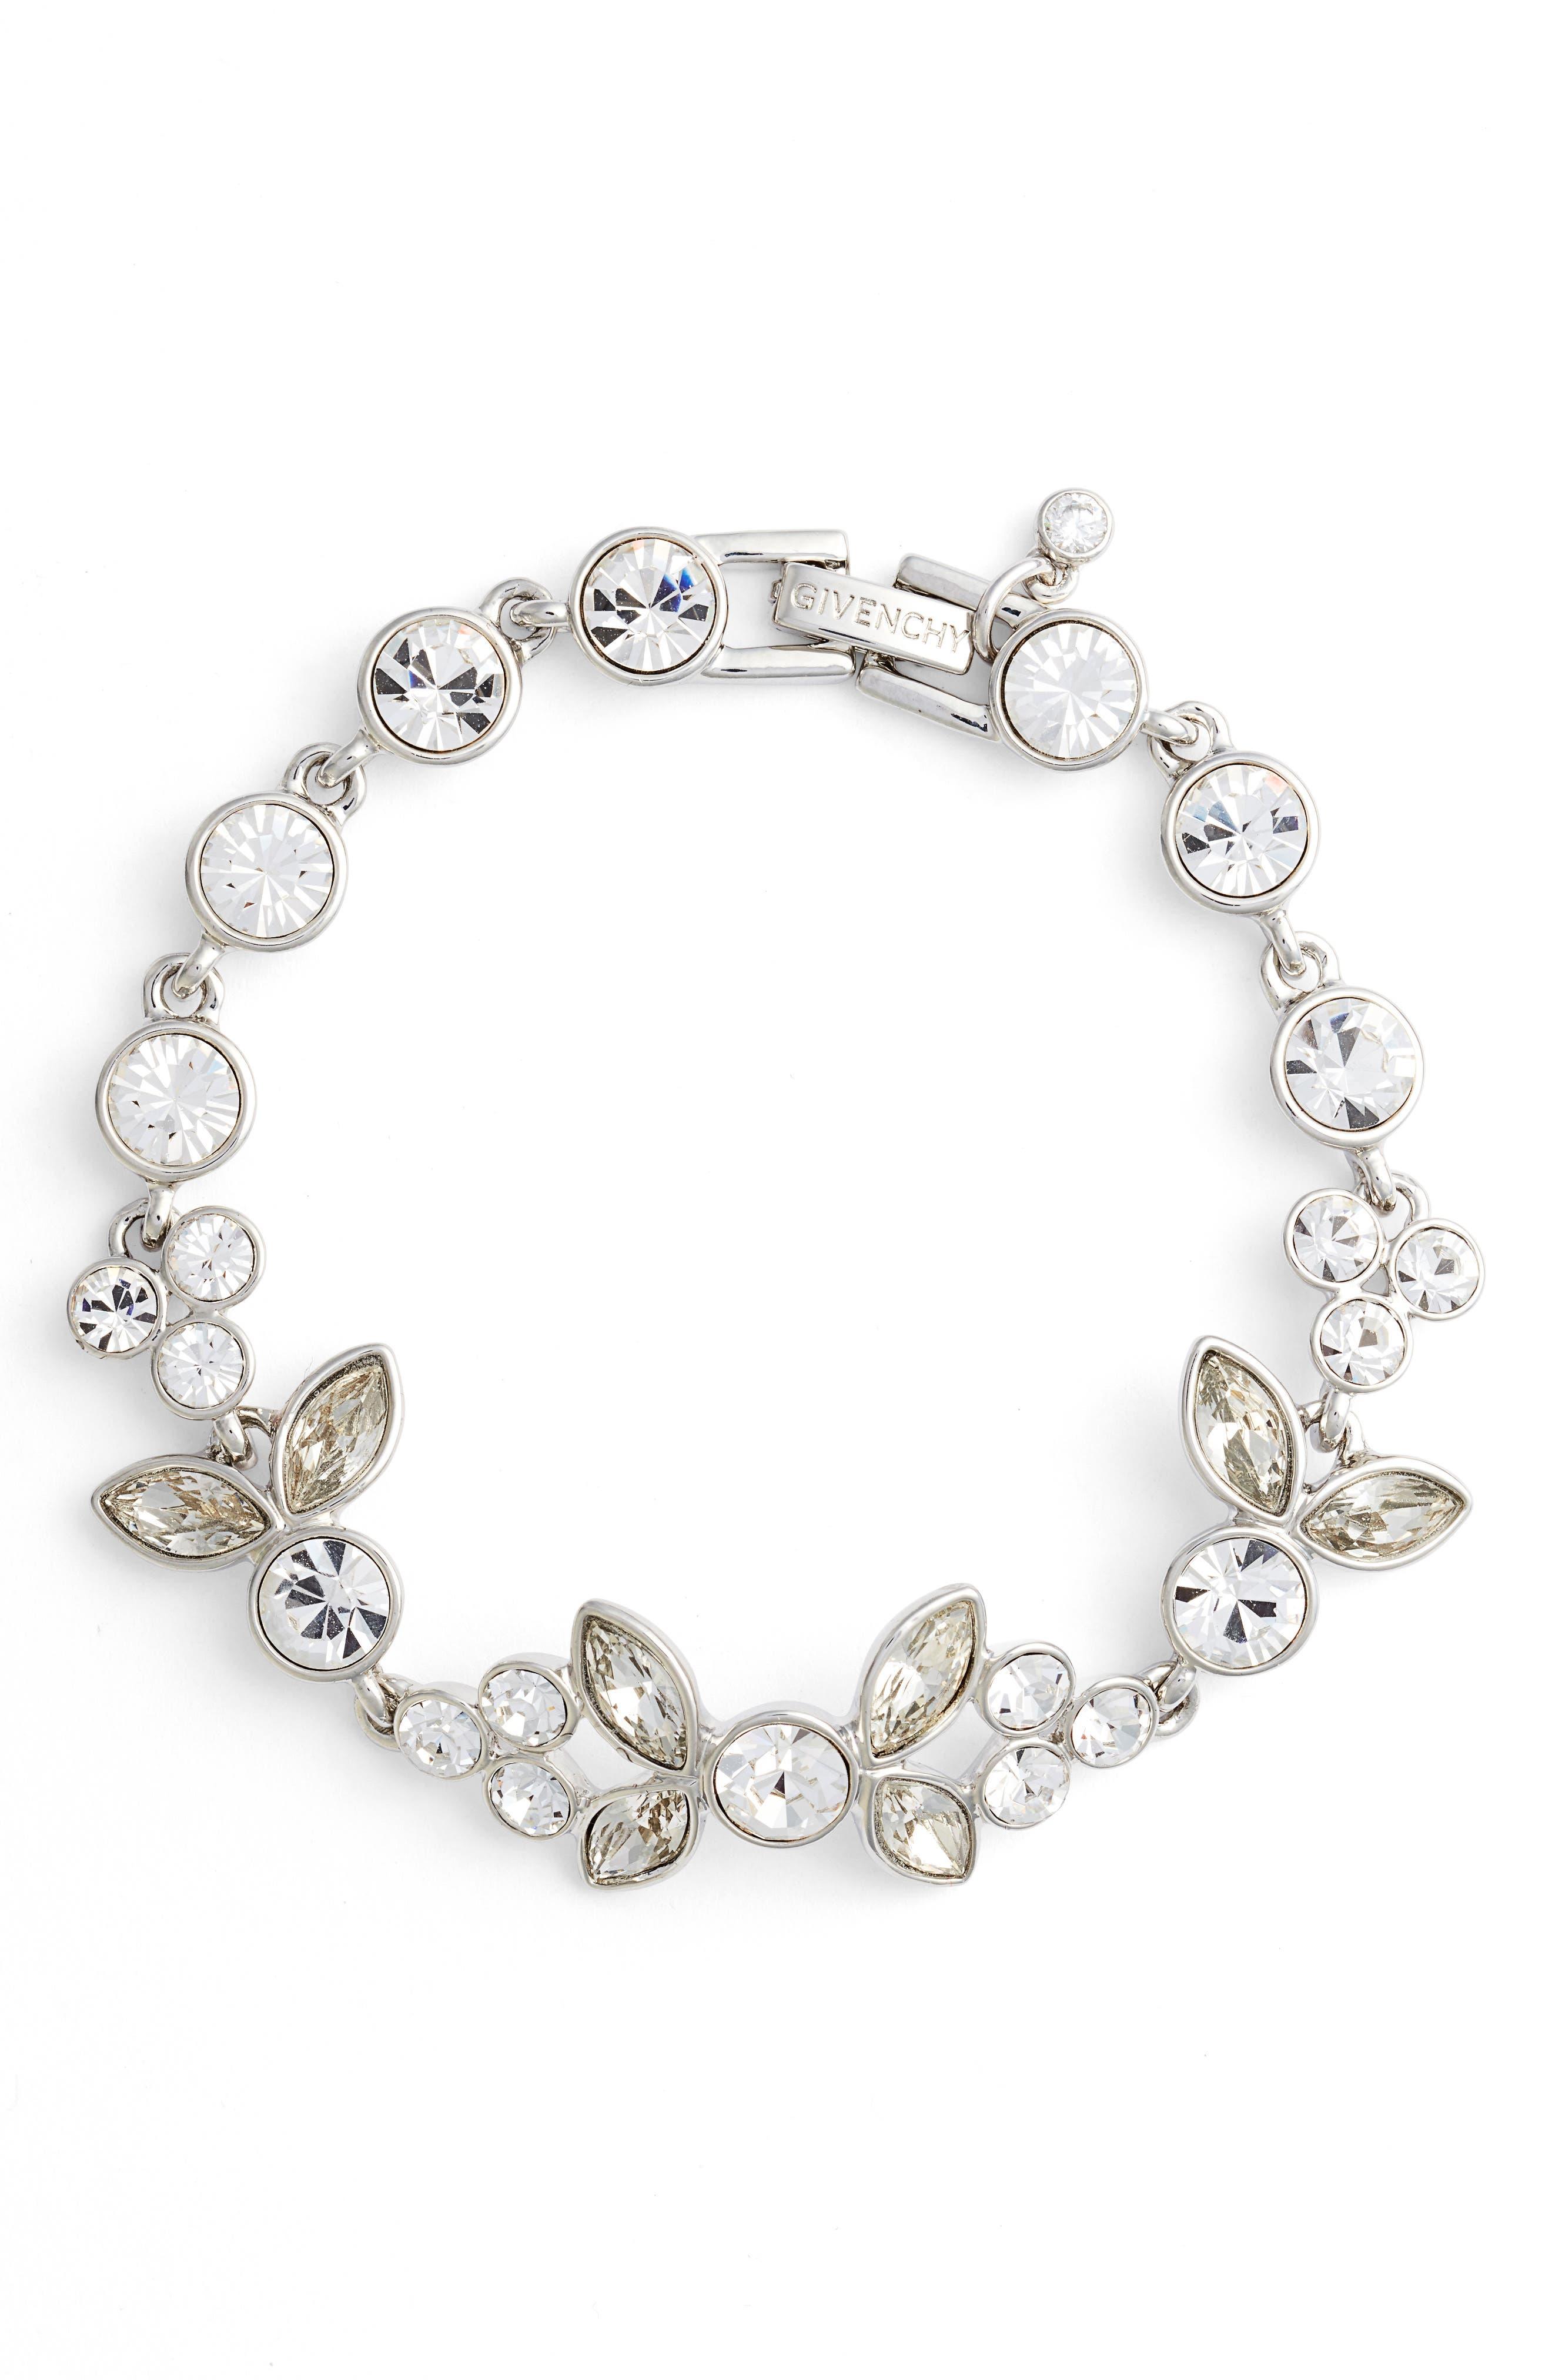 Main Image - Givenchy Sydney Crystal Flex Bracelet